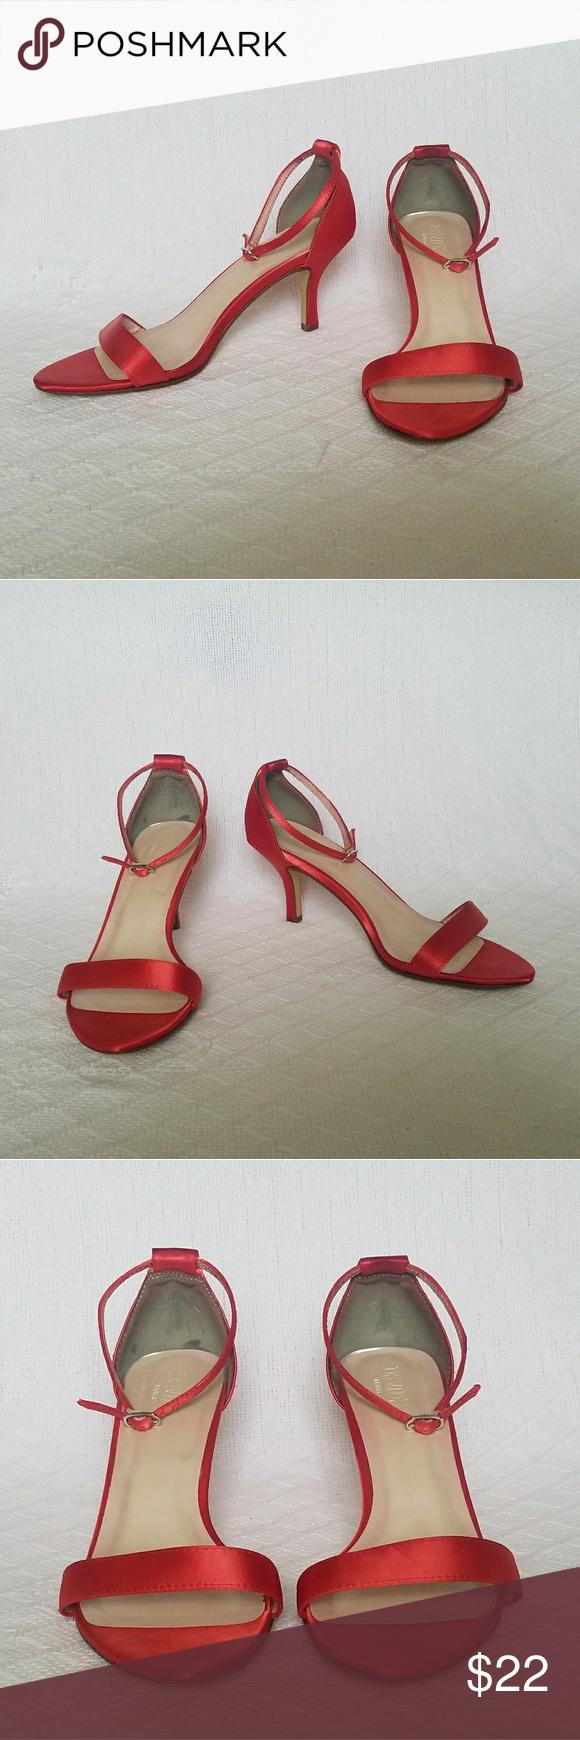 ddda82725 David s Bridal Red Heels David s Bridal red satin like heels.  Color is a  lighter red